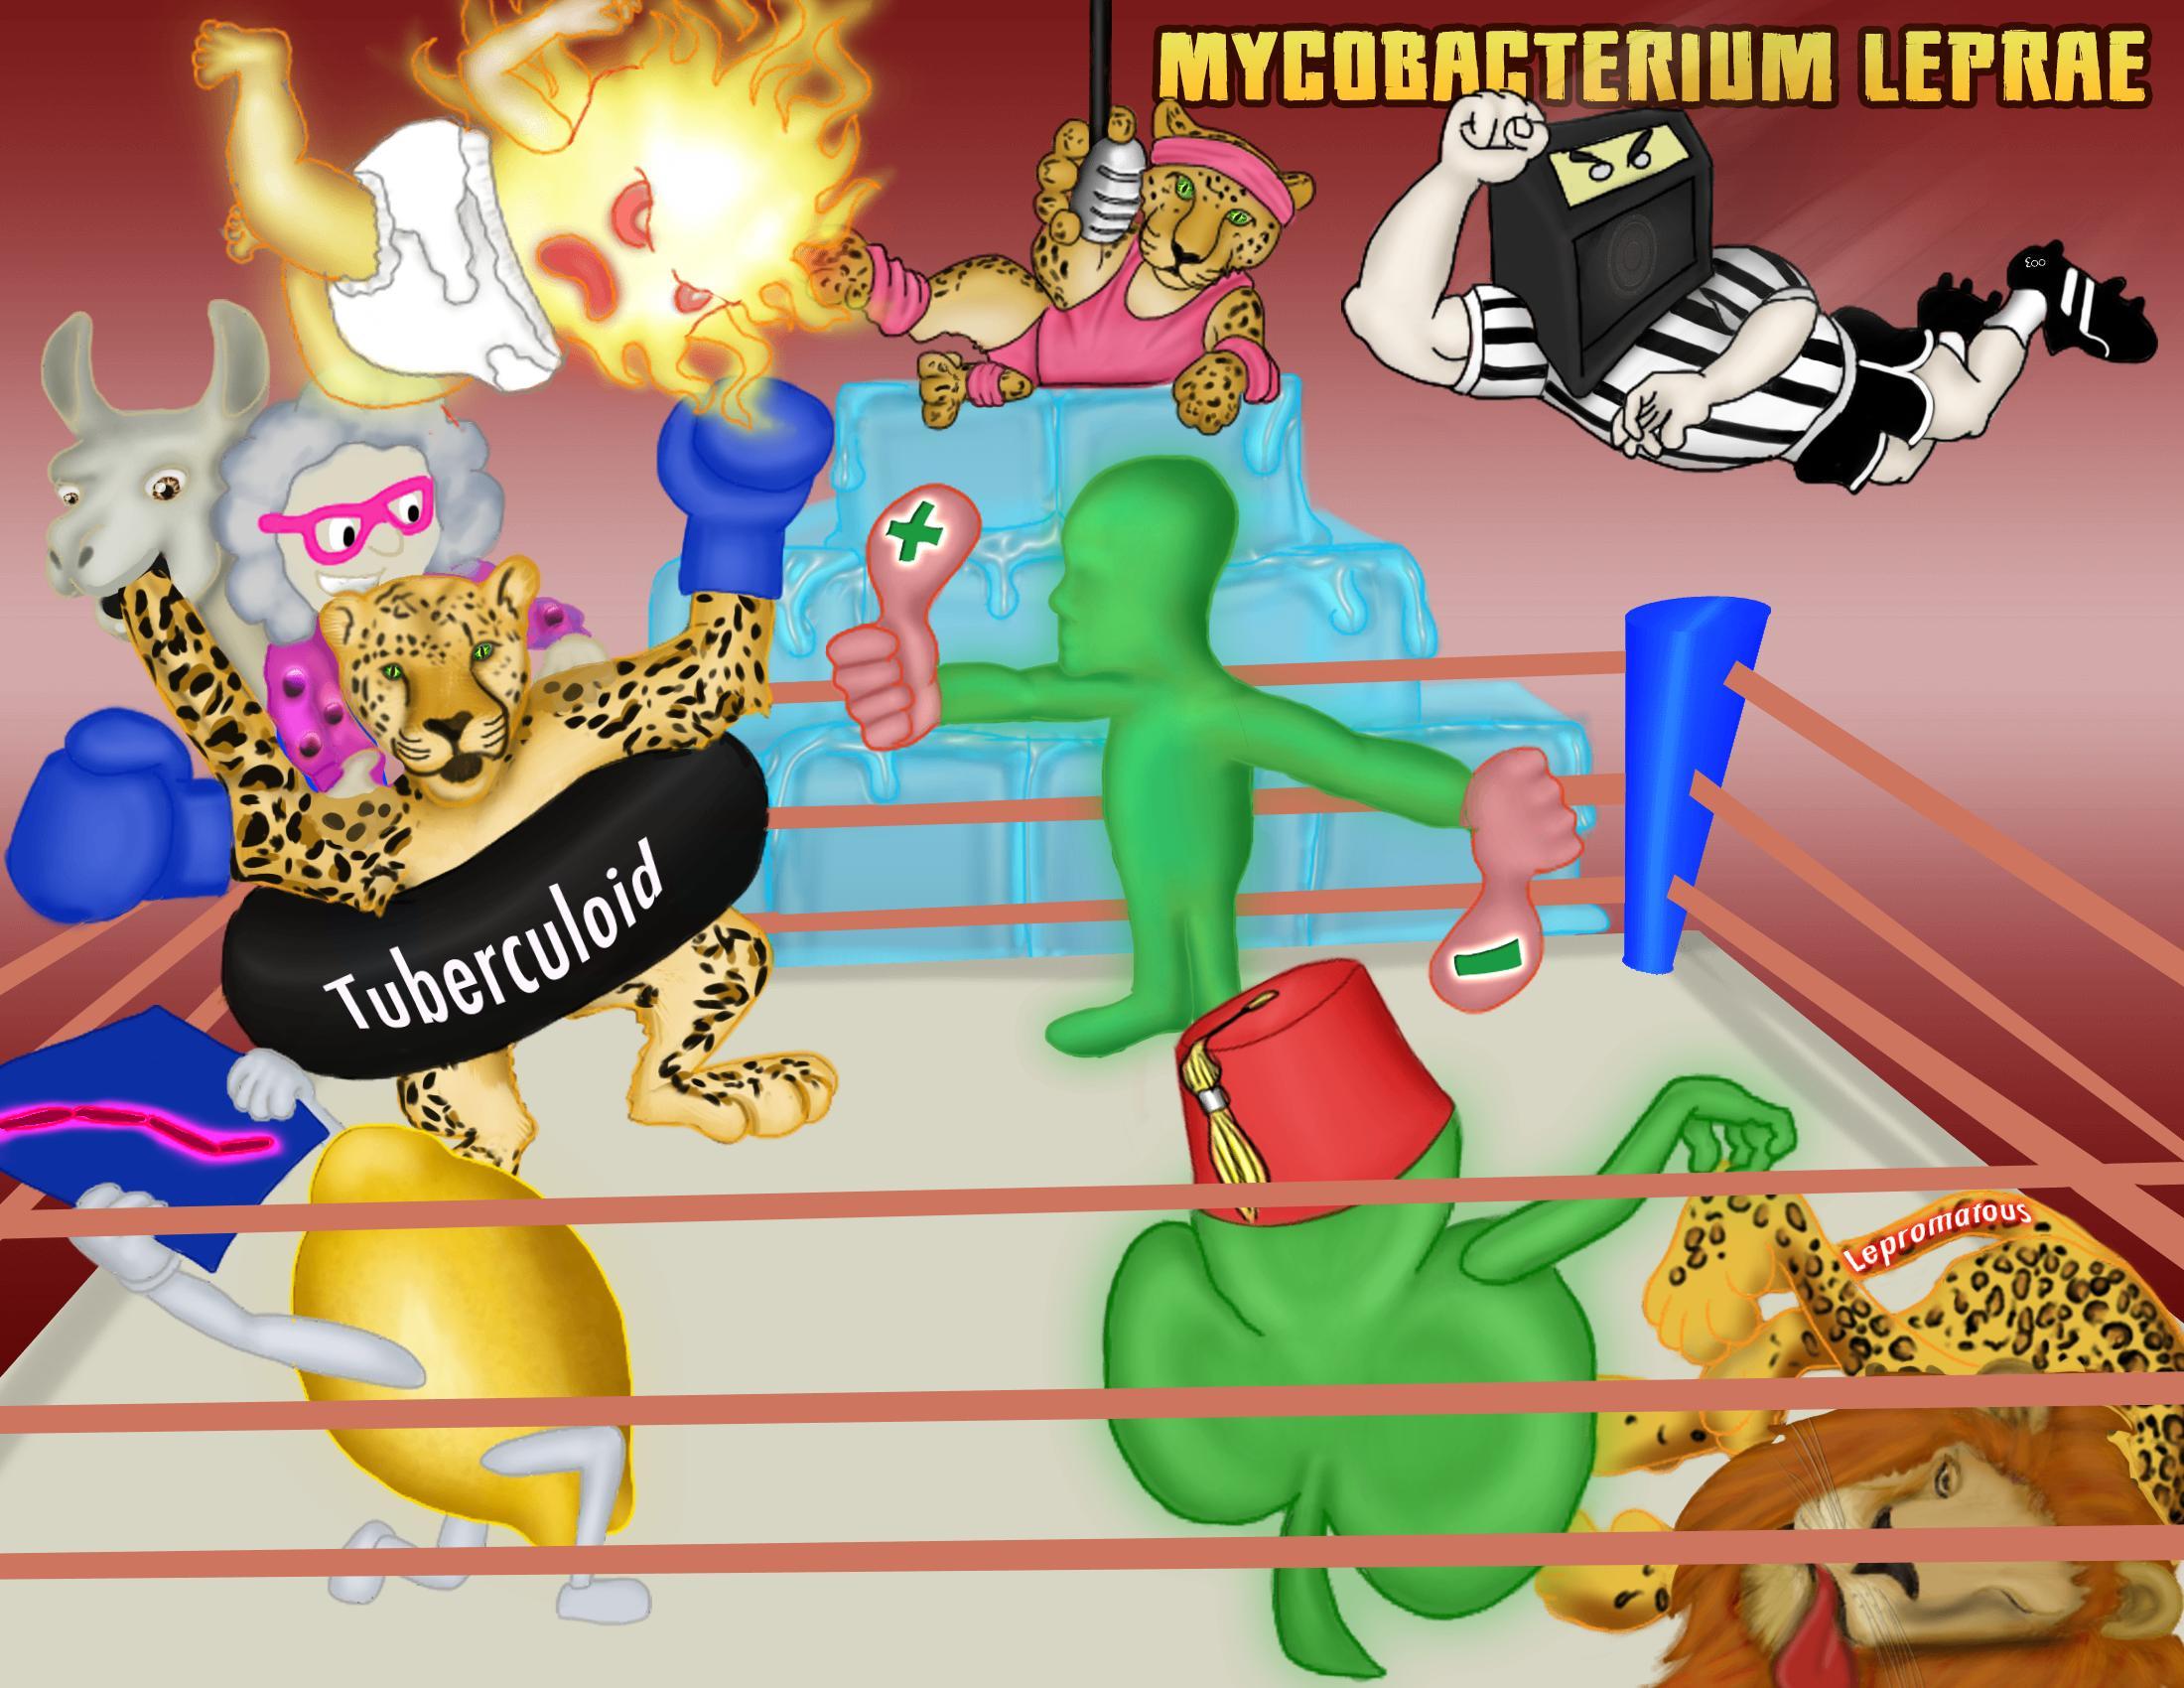 Mycobacterium leprae